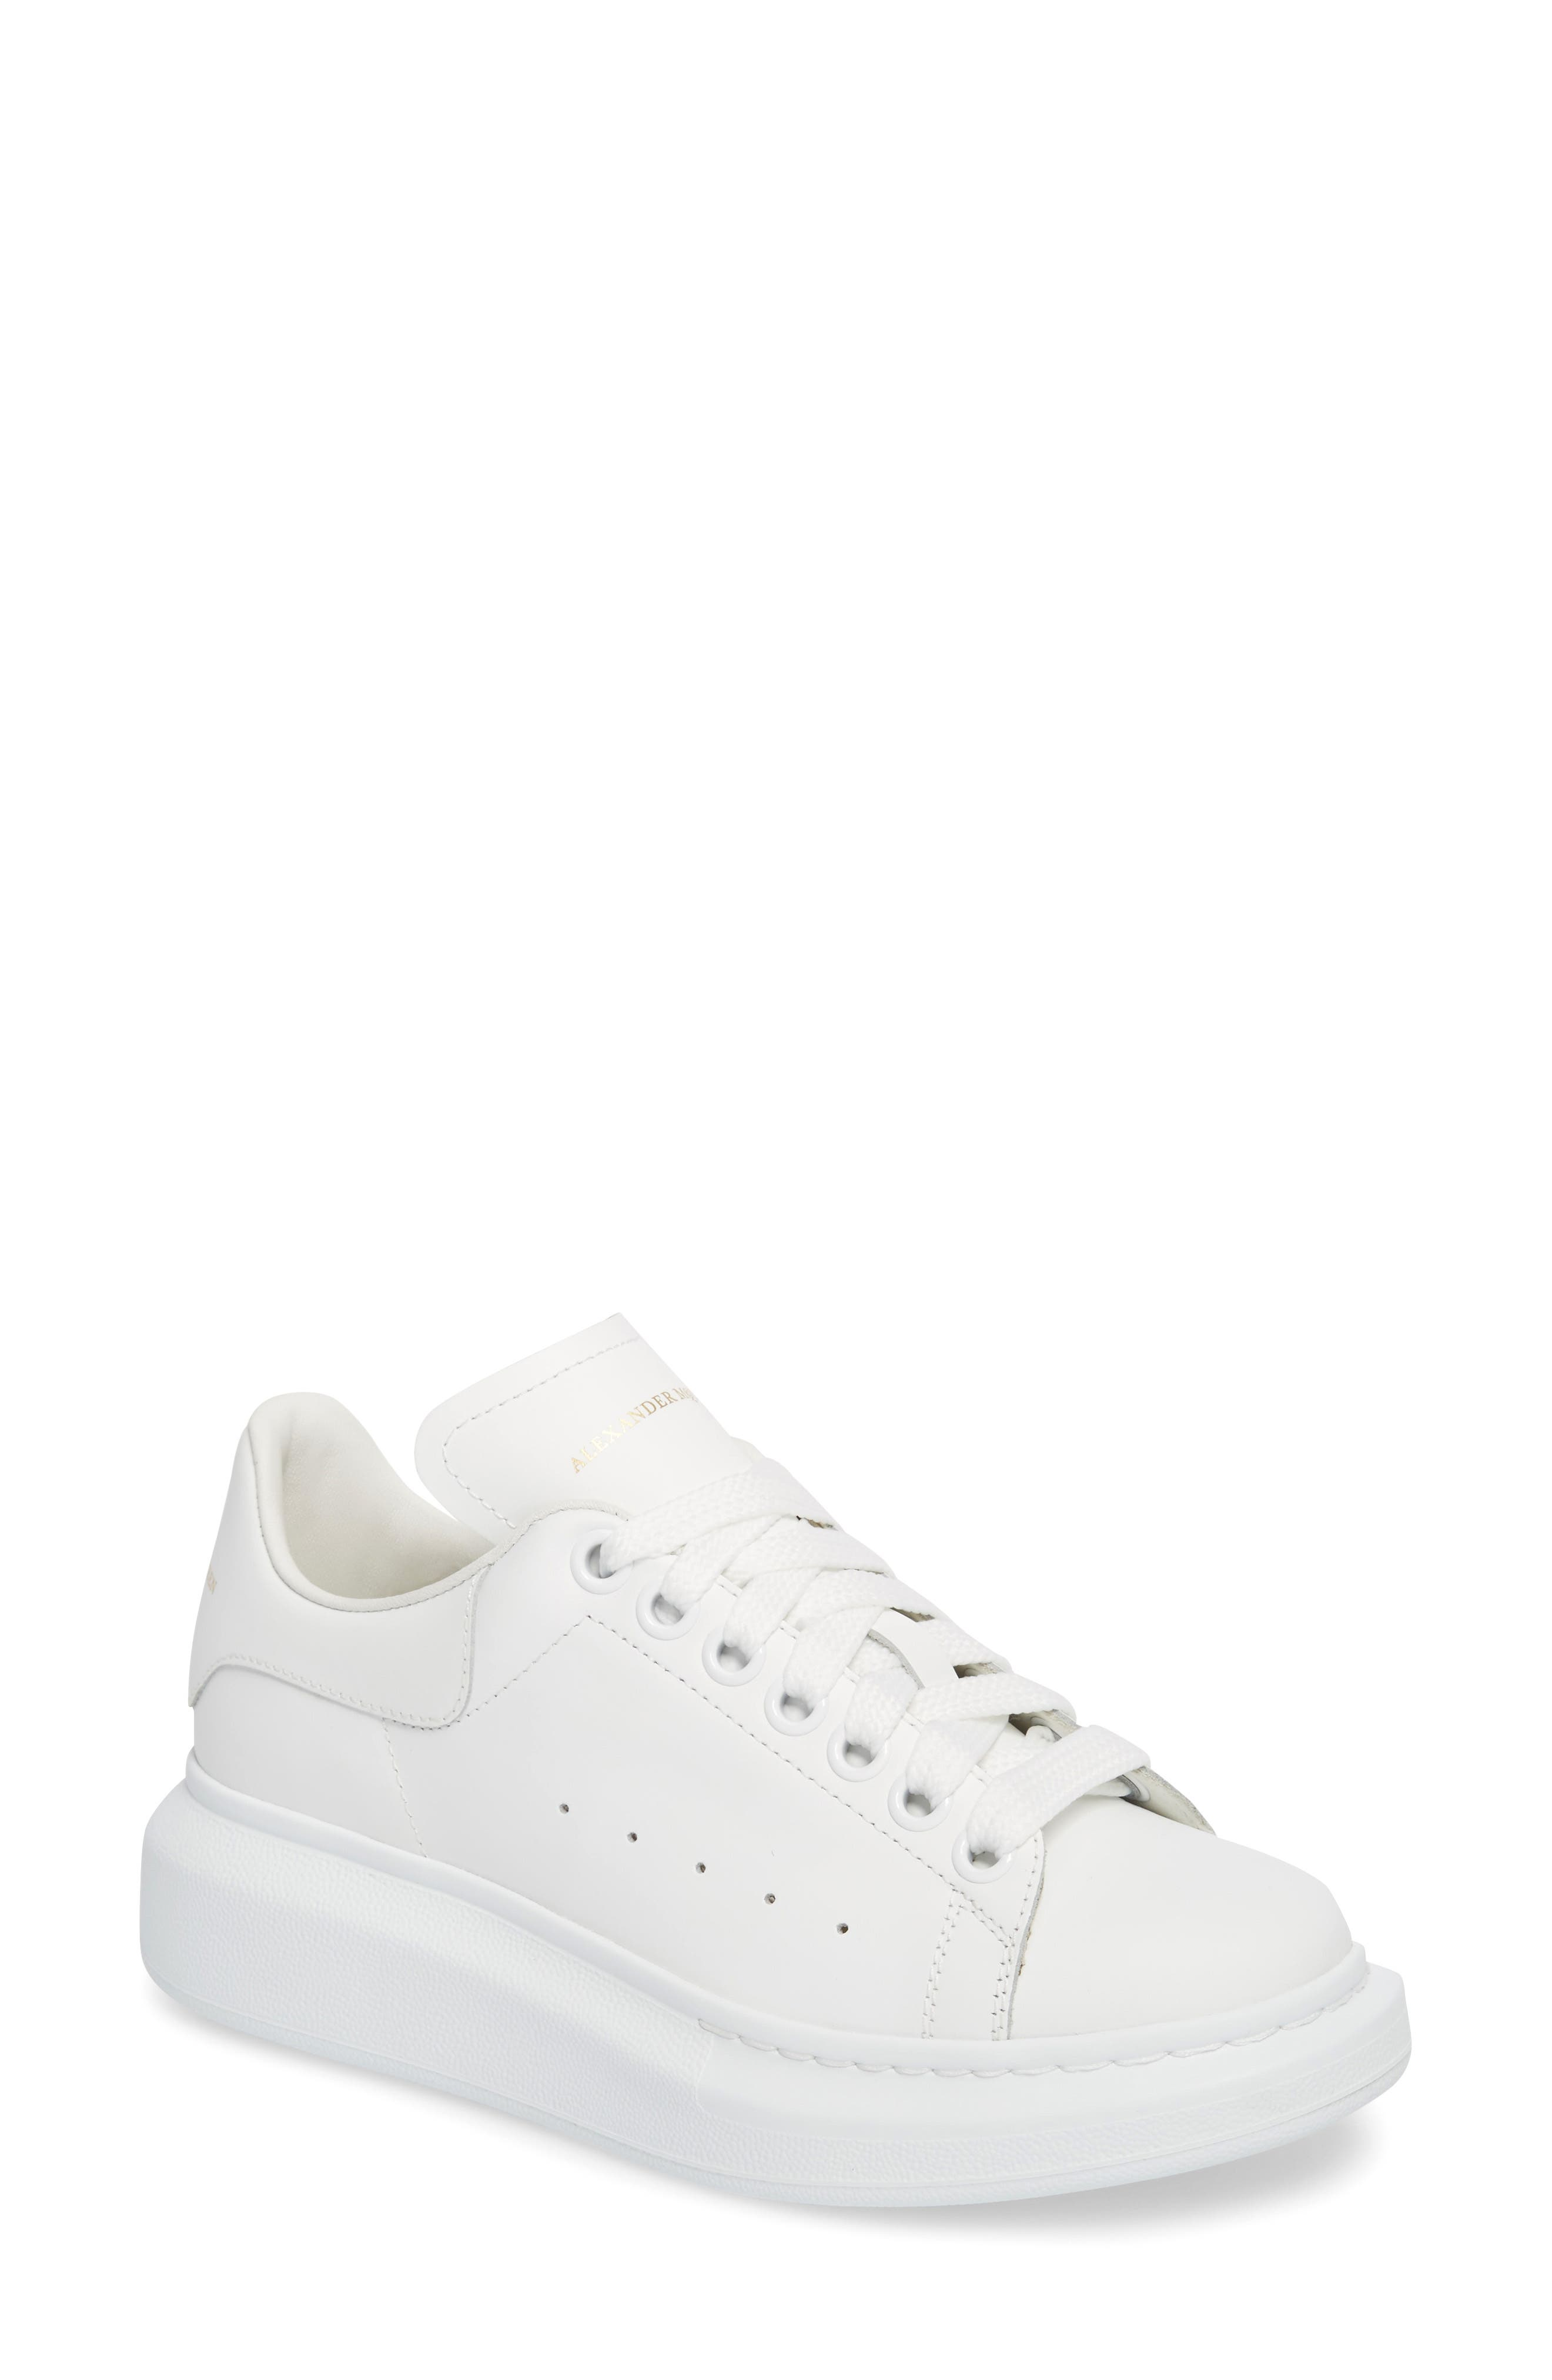 Alexander mcqueen shoes white dress